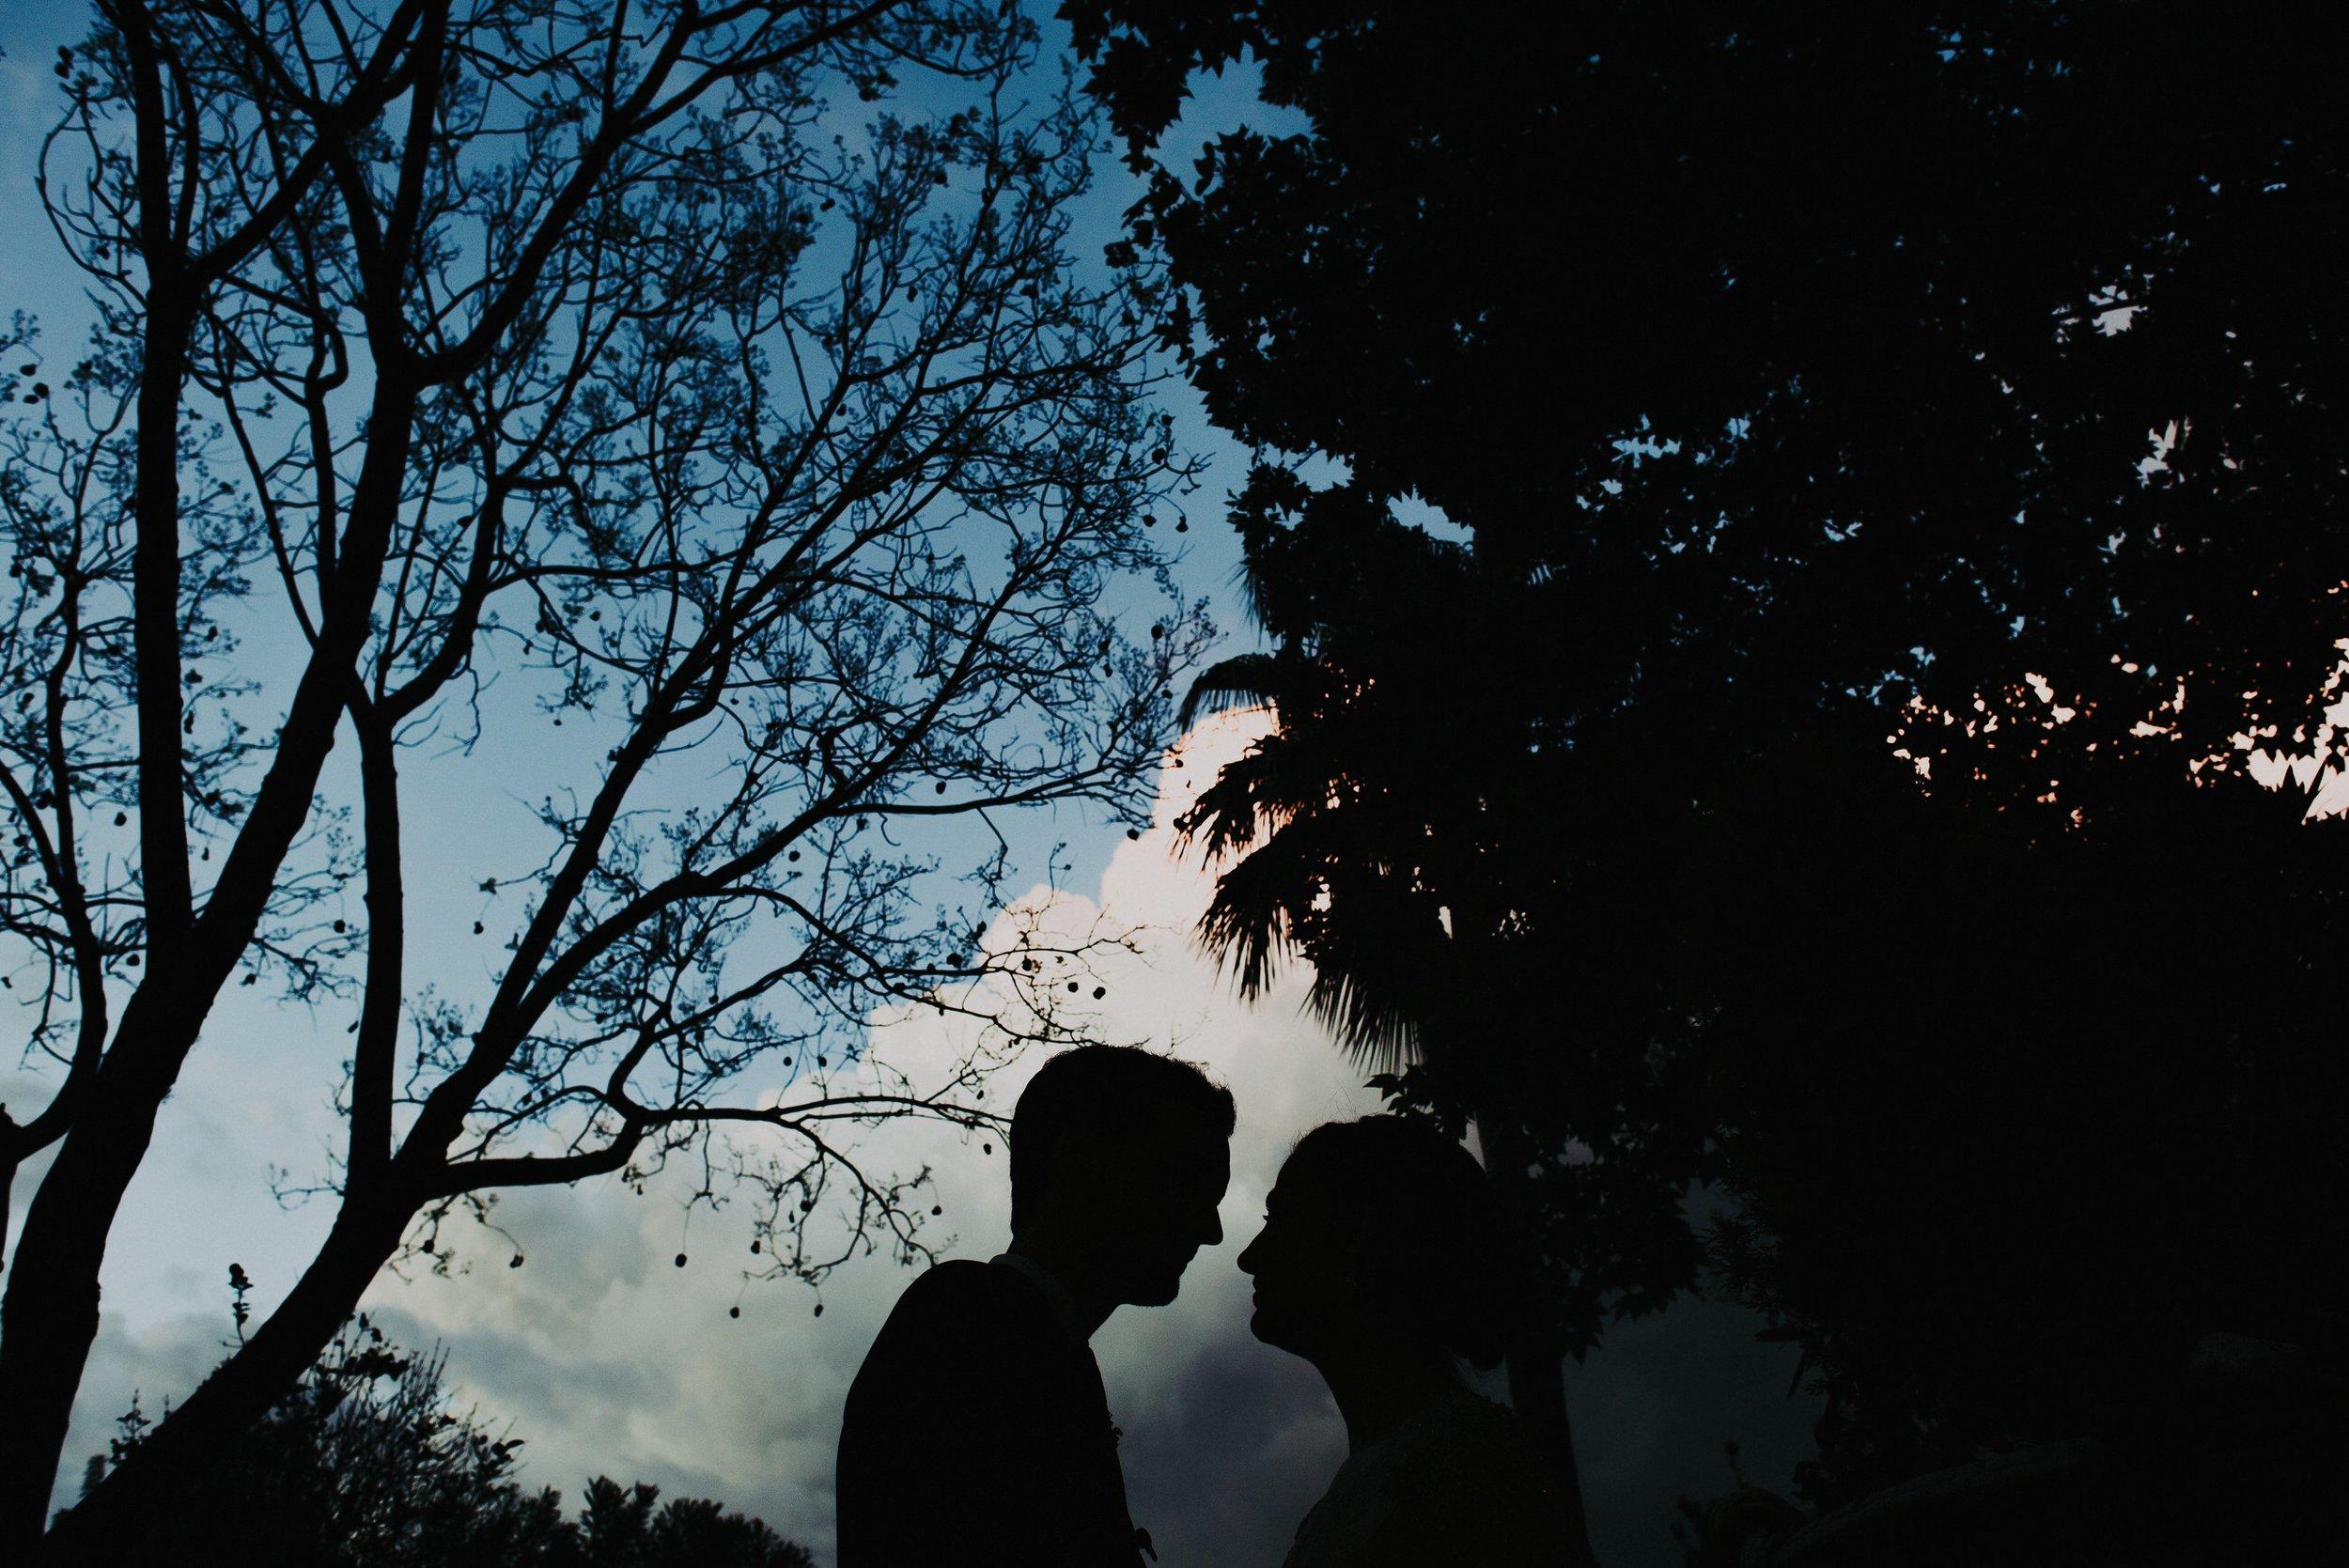 Laura & Rubén - boda en utrera - Santa clotilde- Manolo mayo - Fotografo de boda - Andrés Amarillo AAA_1075-Exposure (34).jpg